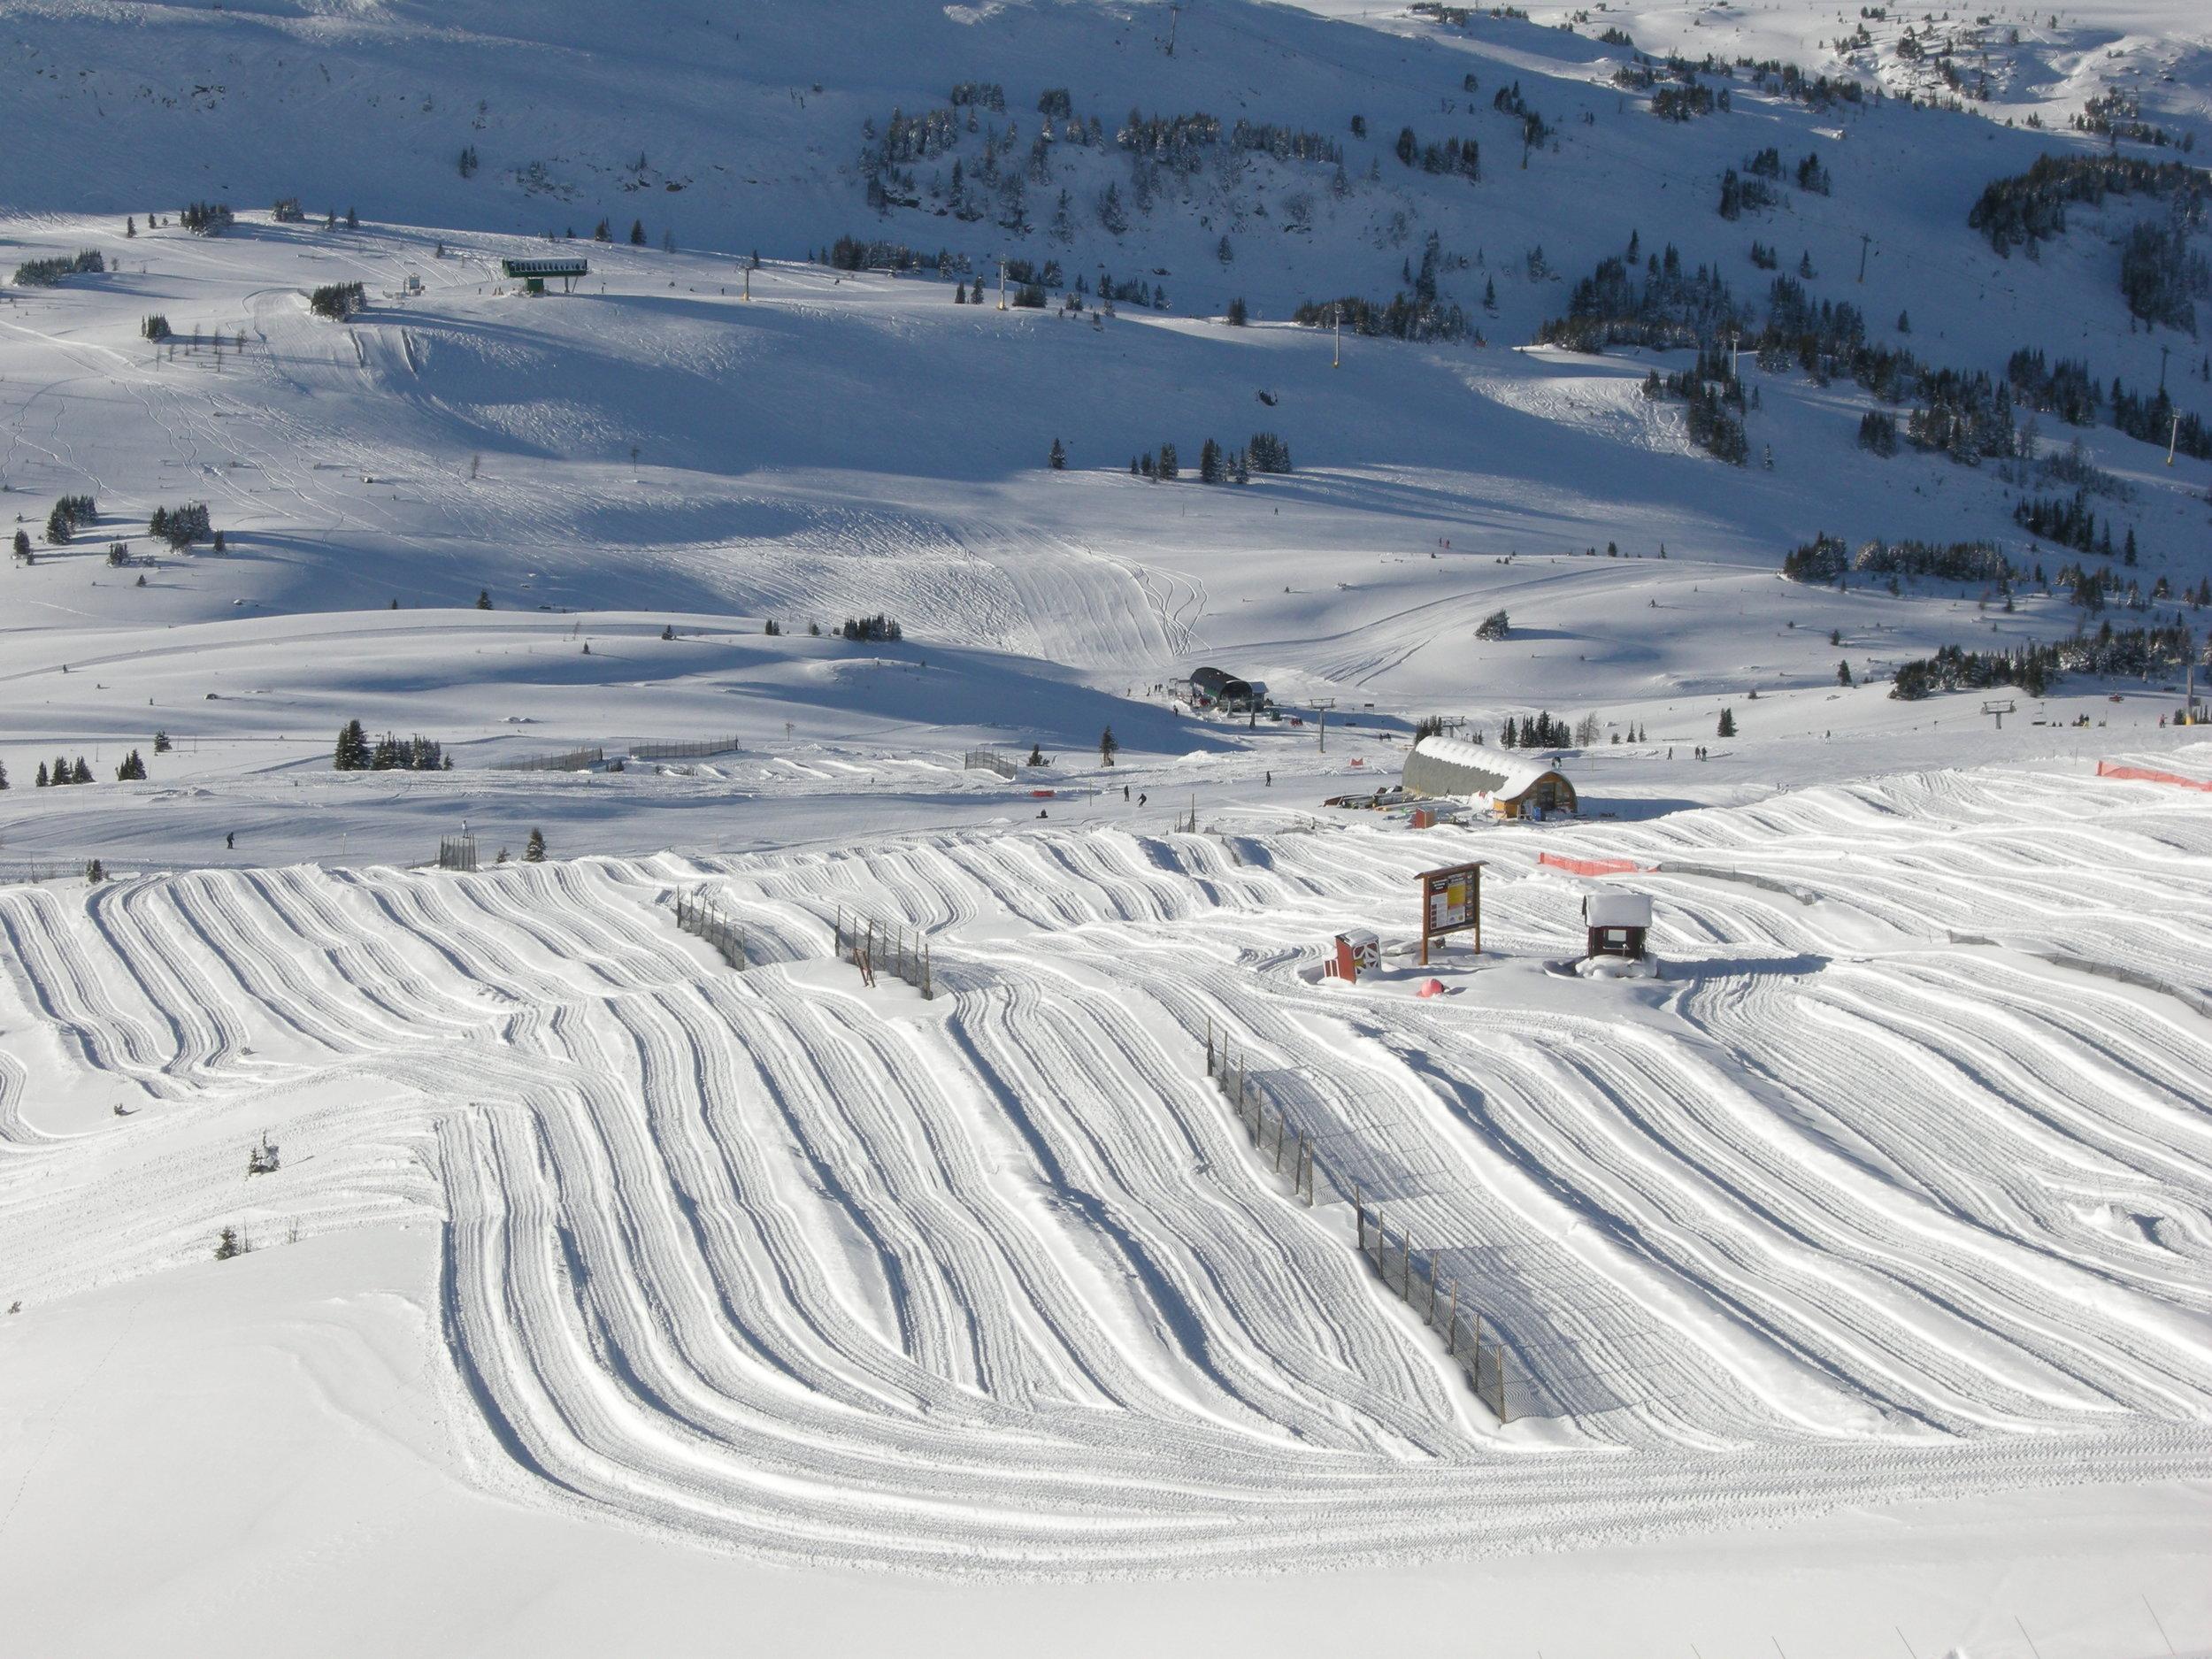 Snow Harvesting At Sunshine 2010